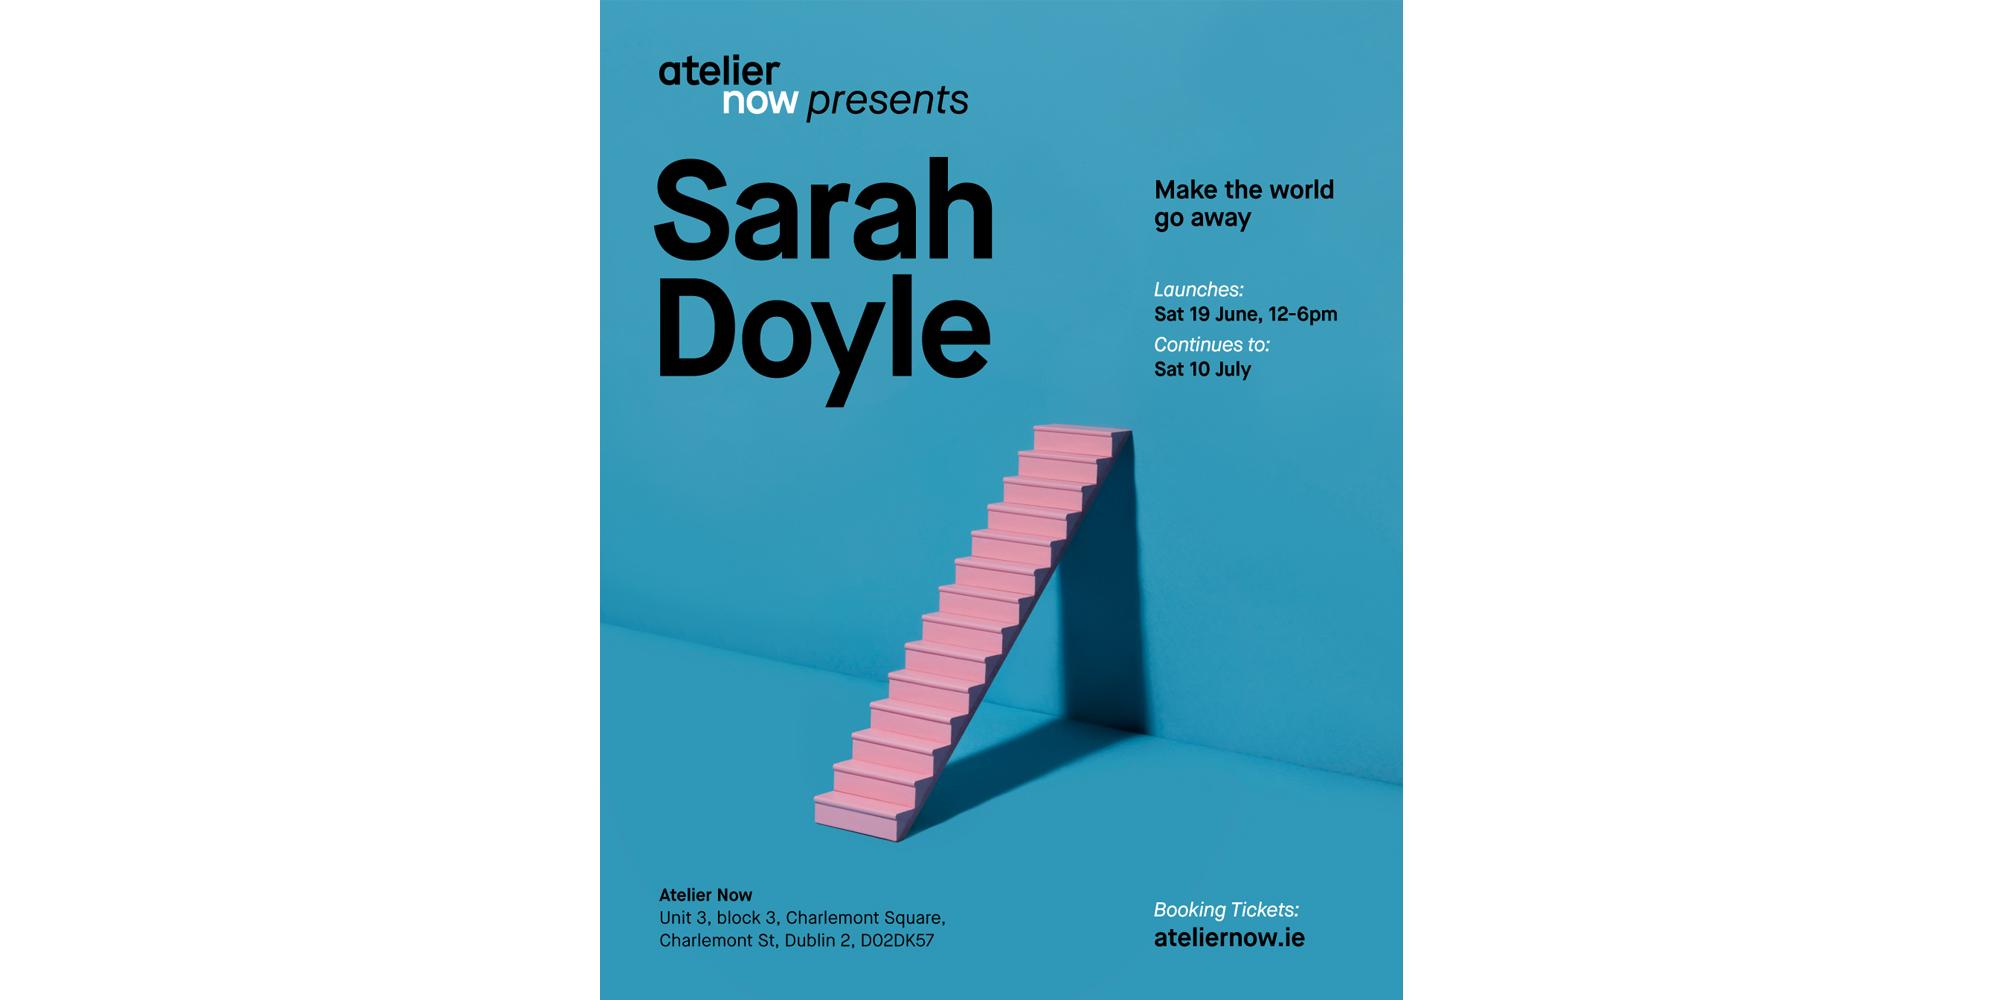 'Make the world go away' | Sarah Doyle at Atelier Now